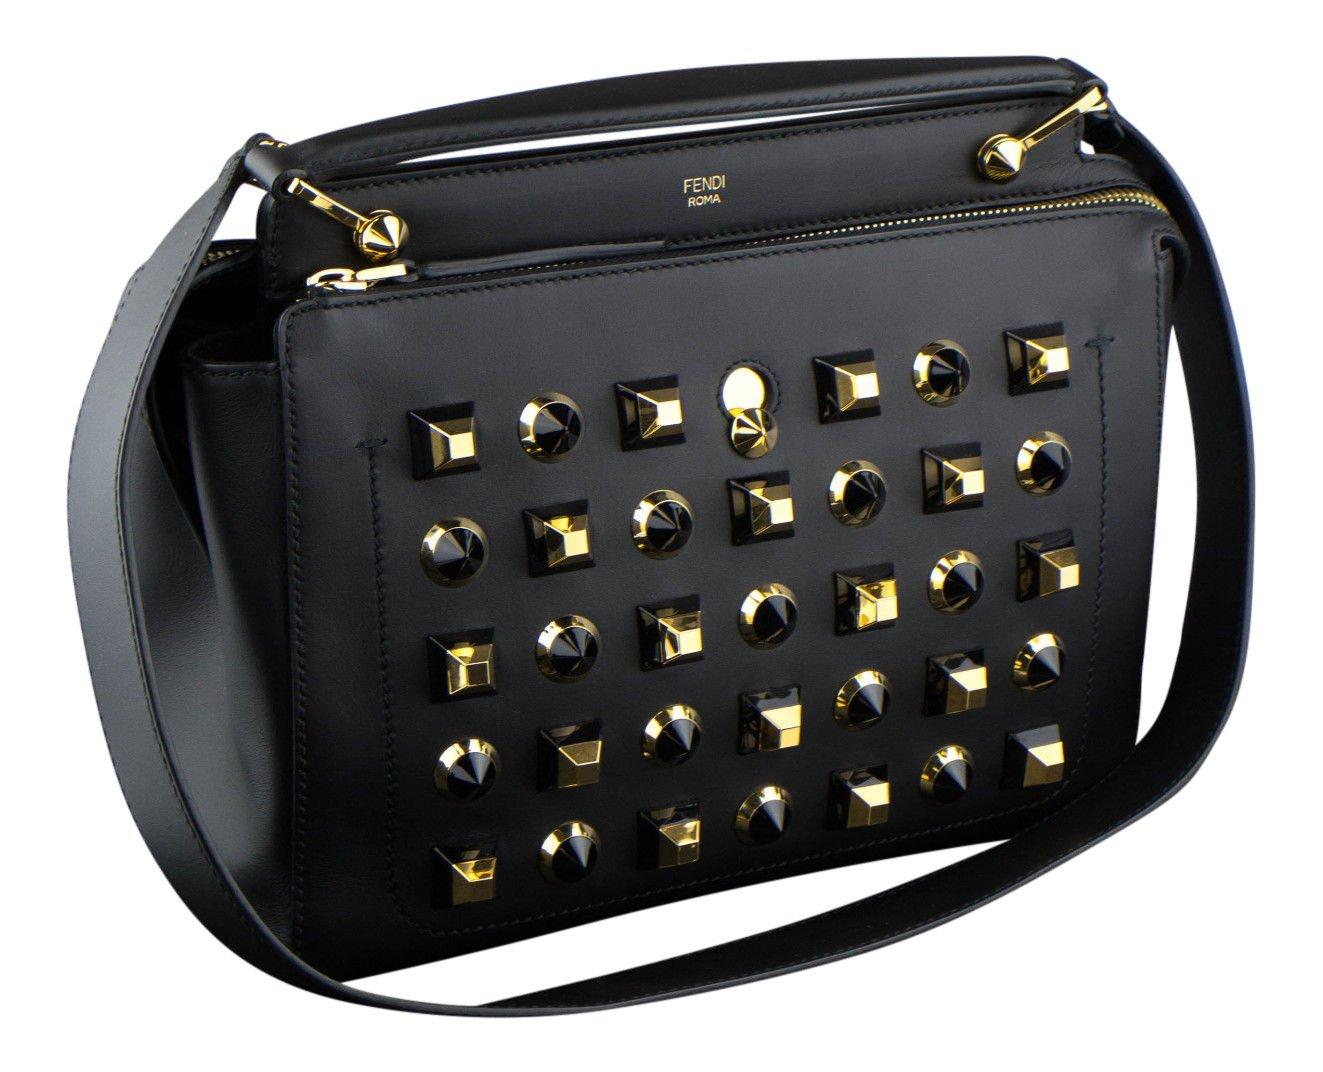 34d0ab9525b4 Amazon.com   Fendi Black and Gold Leather Dotcom Studded Satchel Bag   Baby